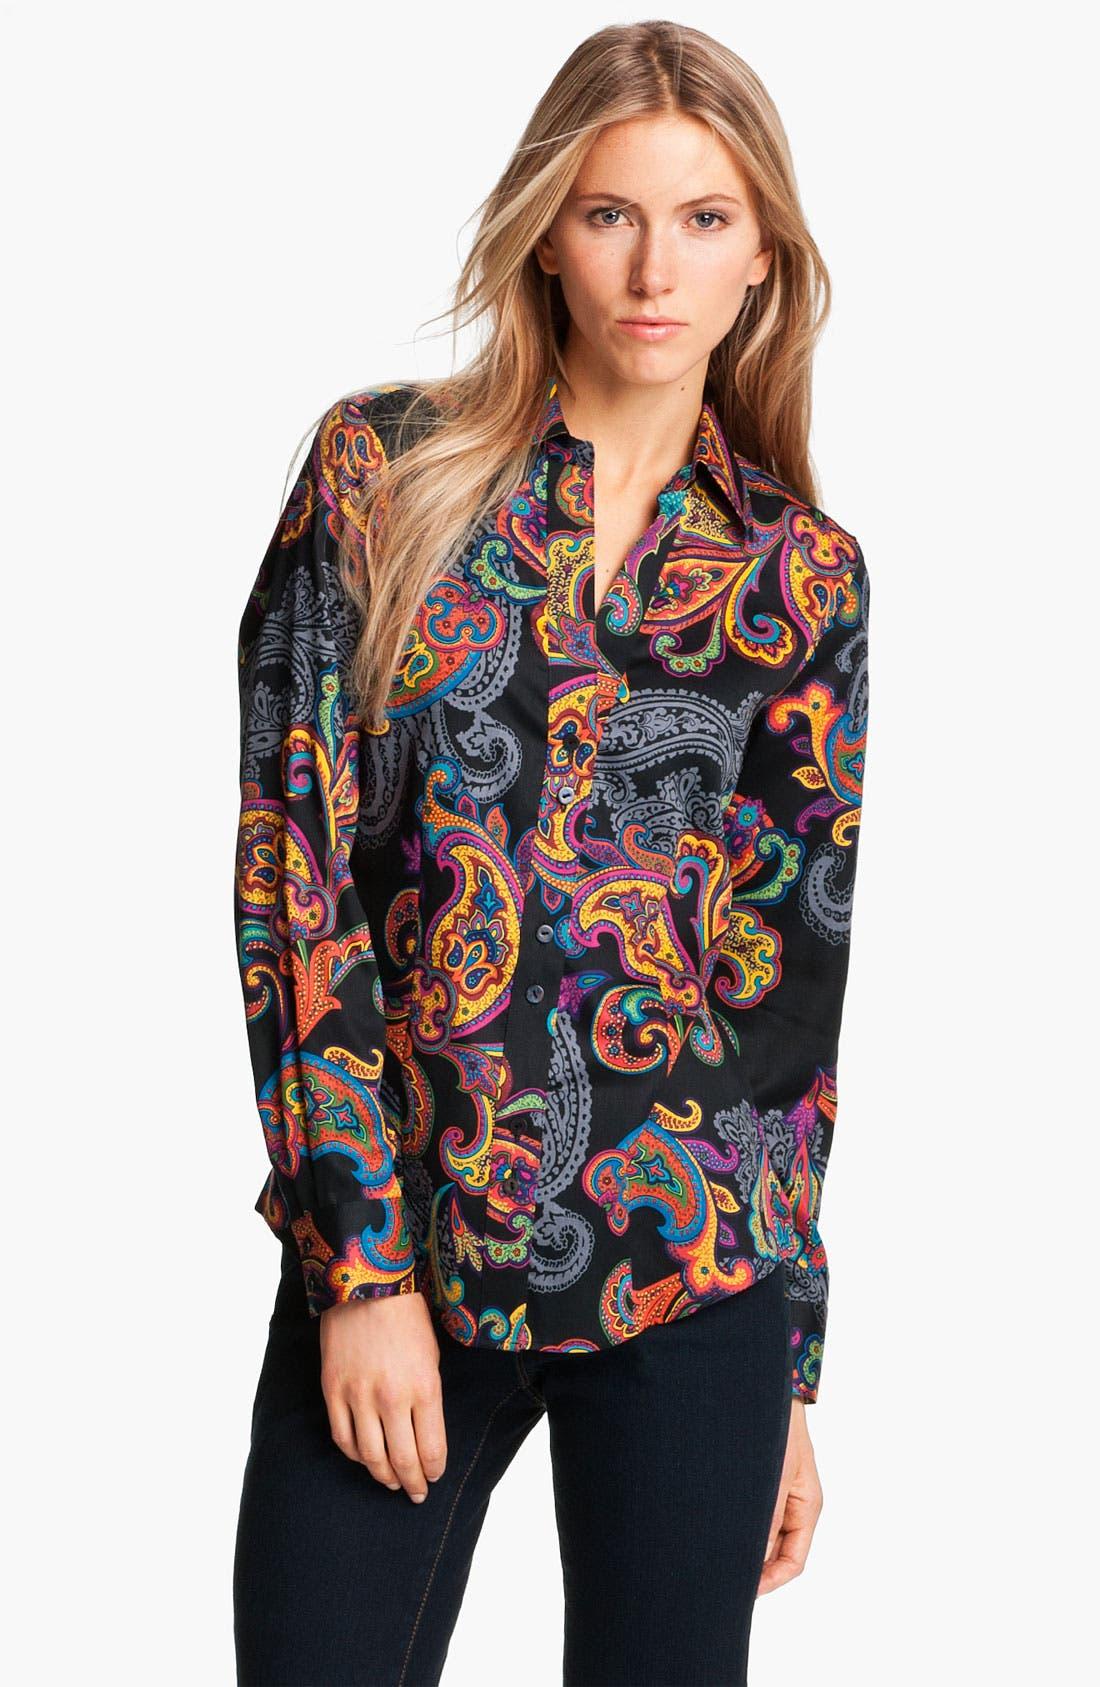 Alternate Image 1 Selected - Foxcroft 'Holiday Paisley' Shirt (Petite)